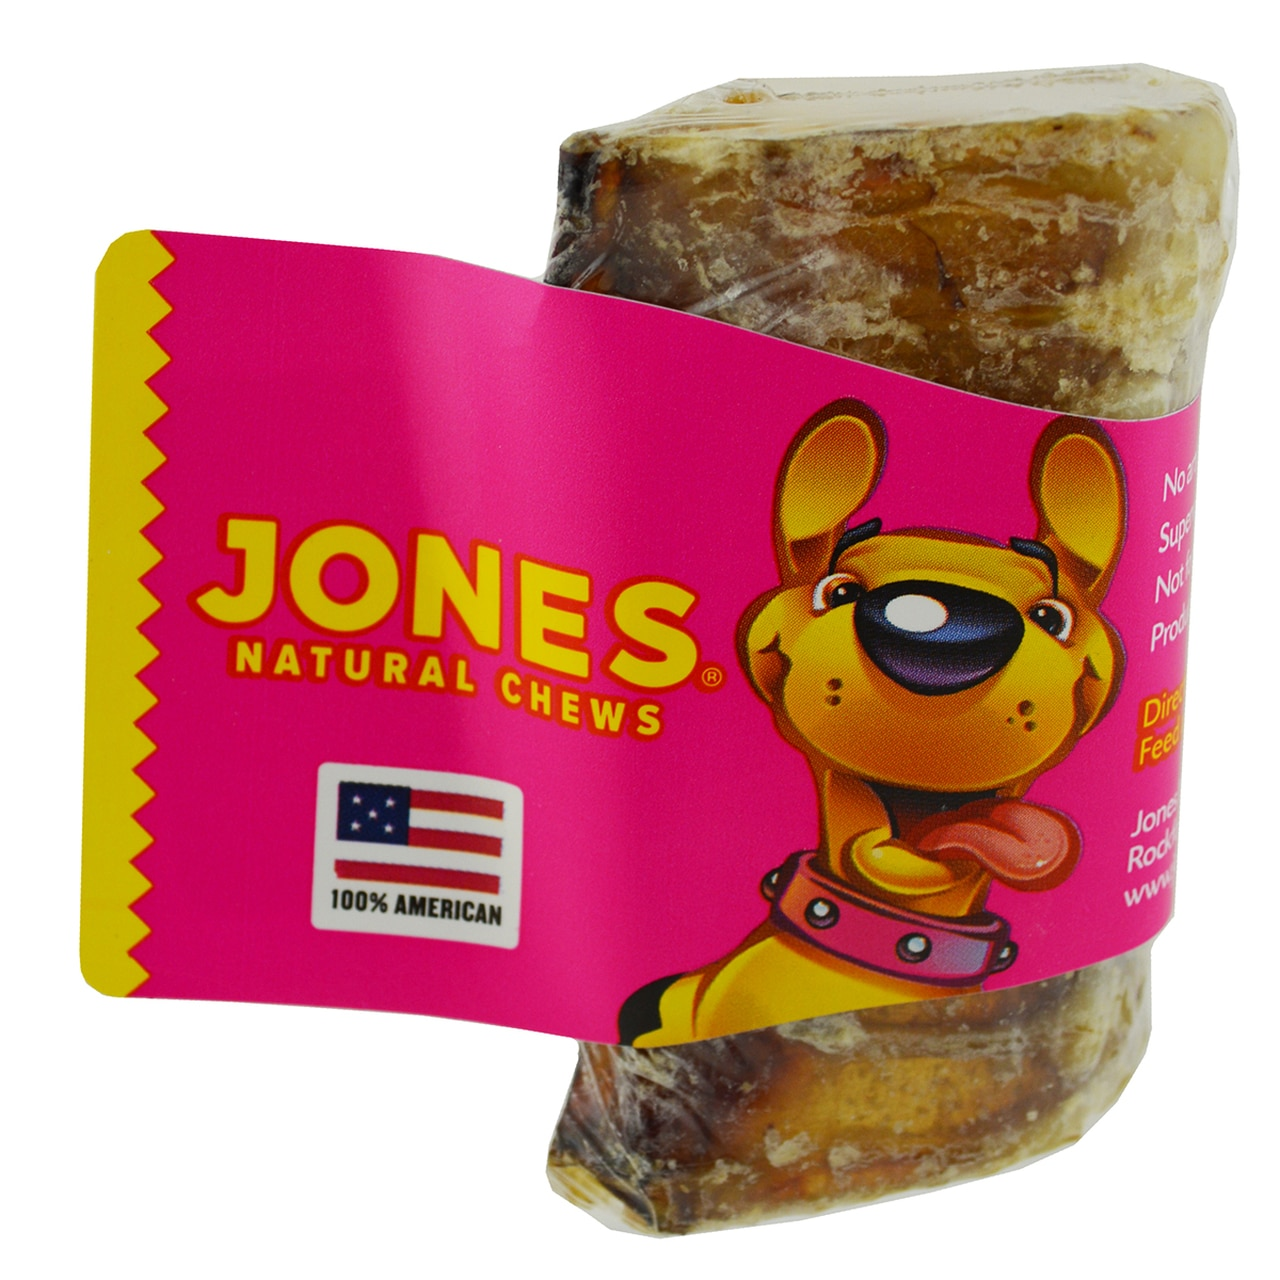 Jones Natural Chews Windees Dog Treats